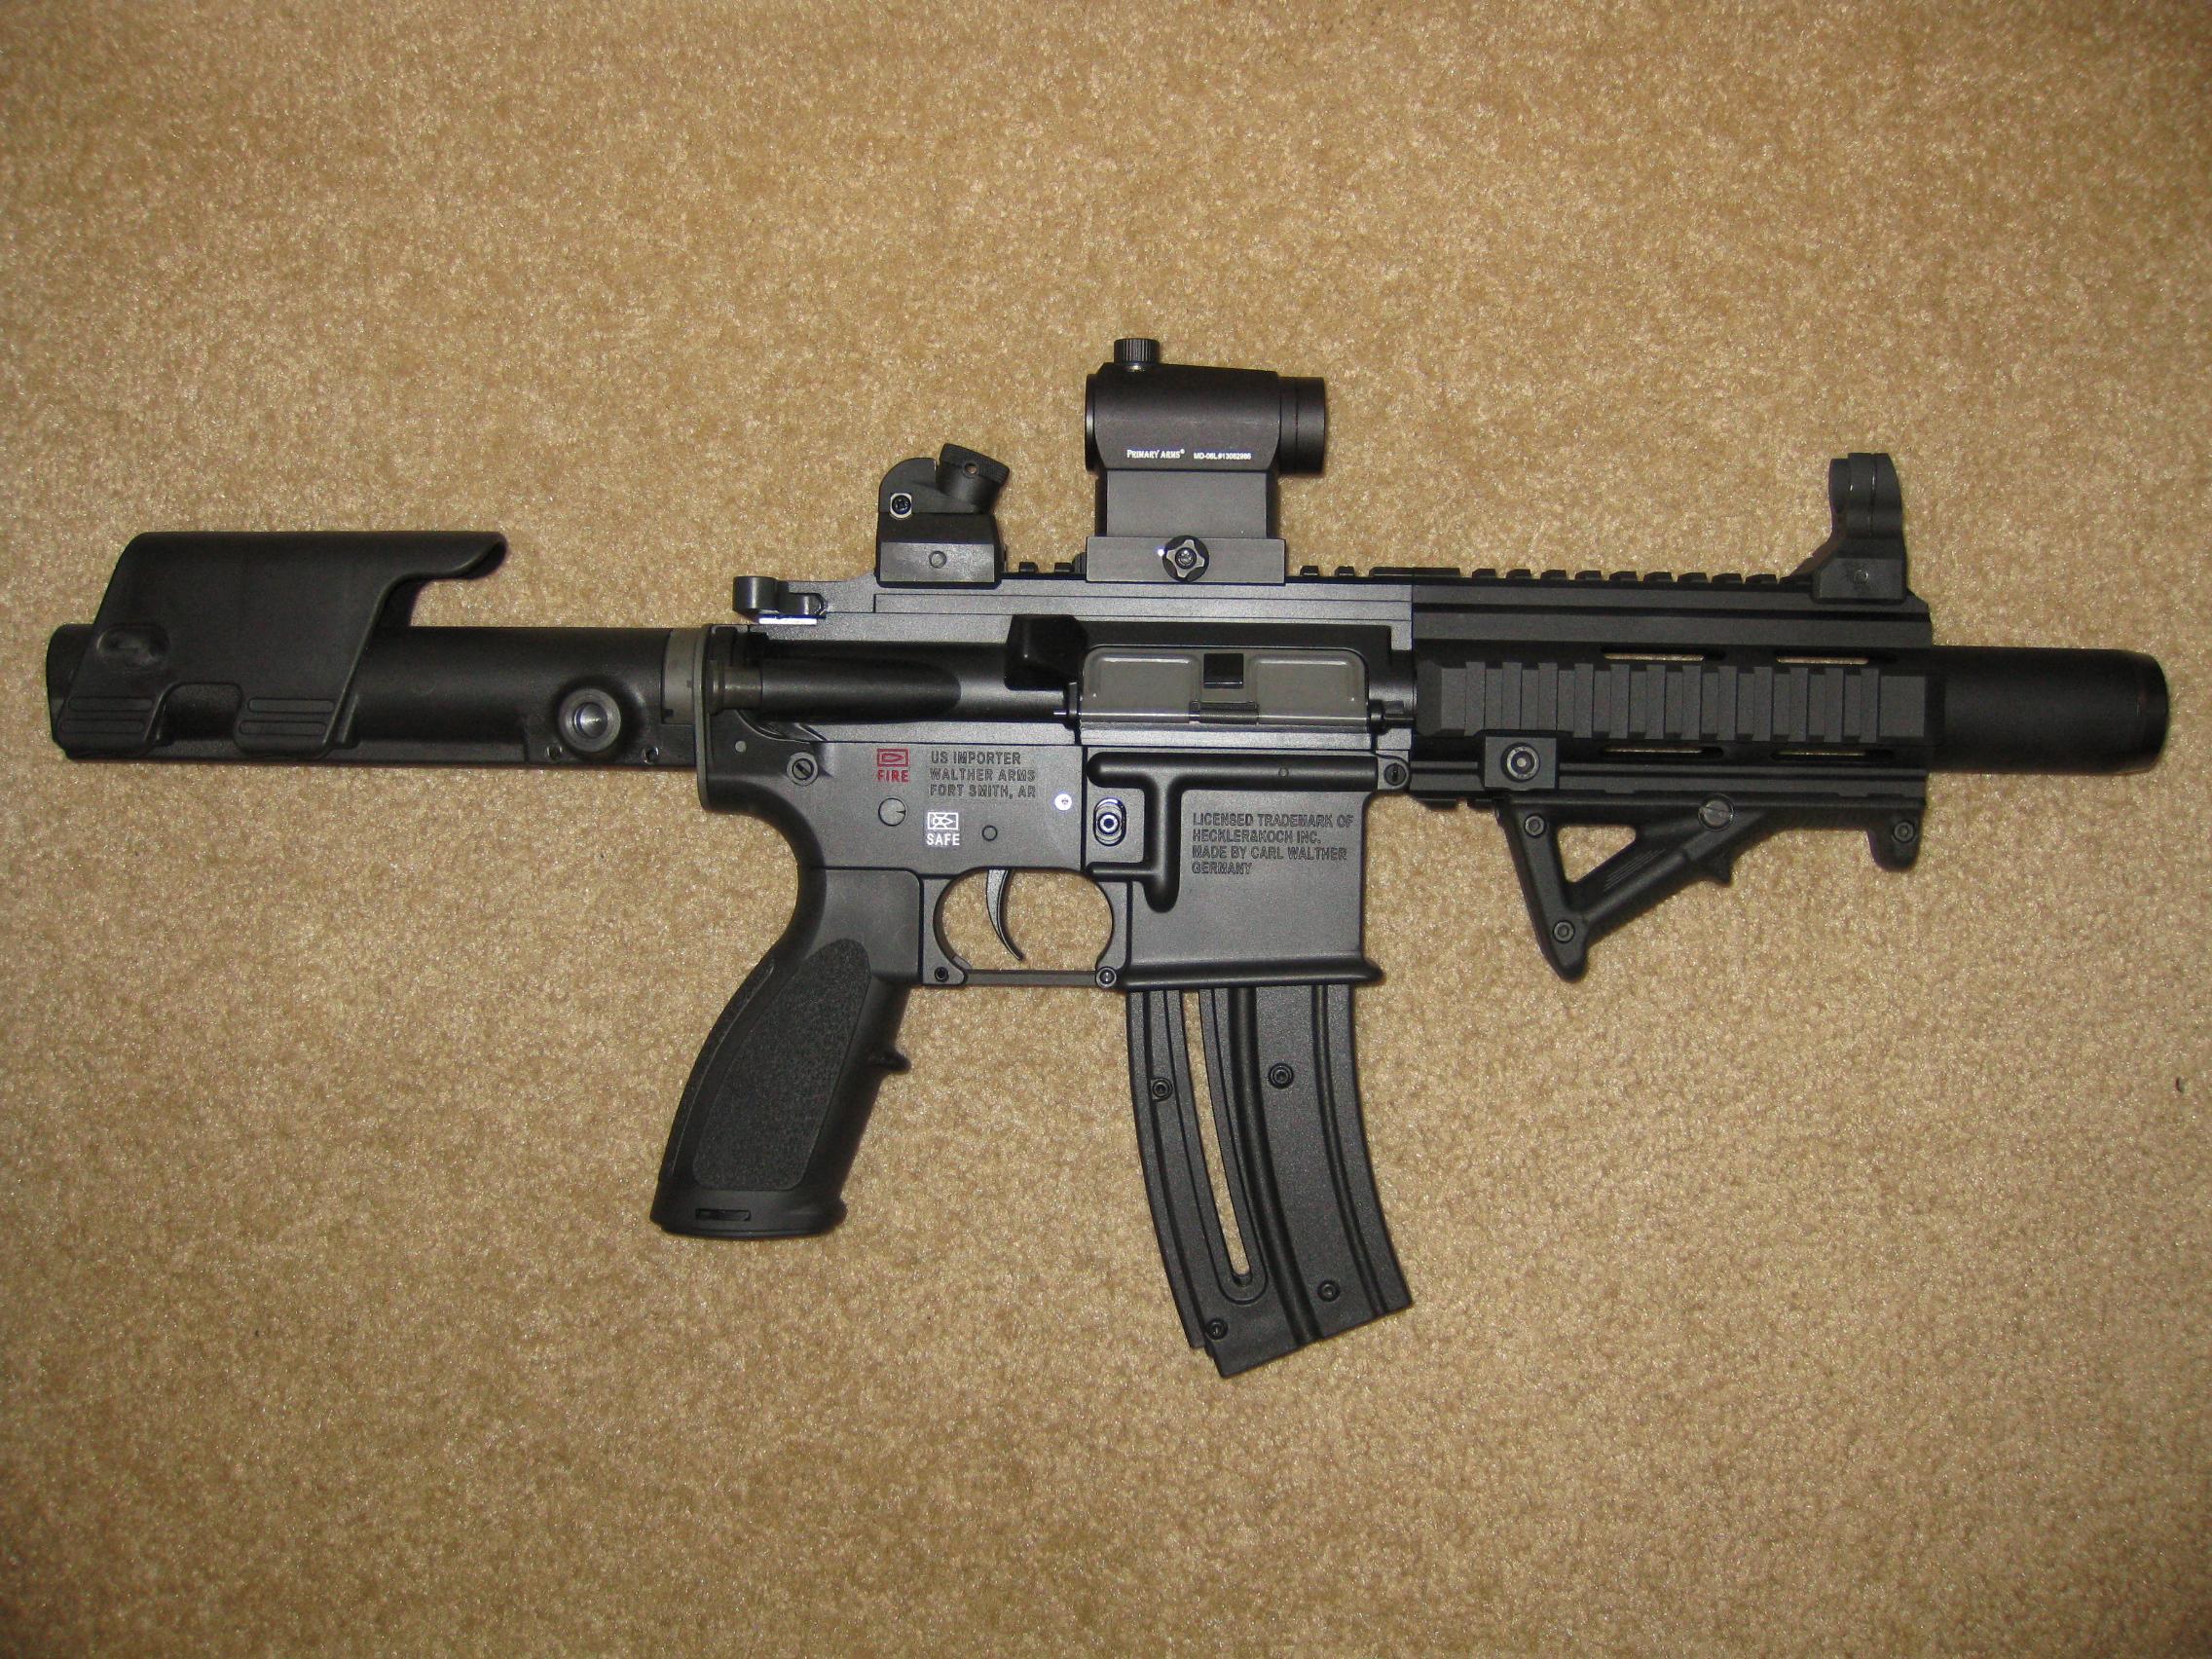 HK 416 22lr Pistol with SigTac Brace      Installation       - Page 2